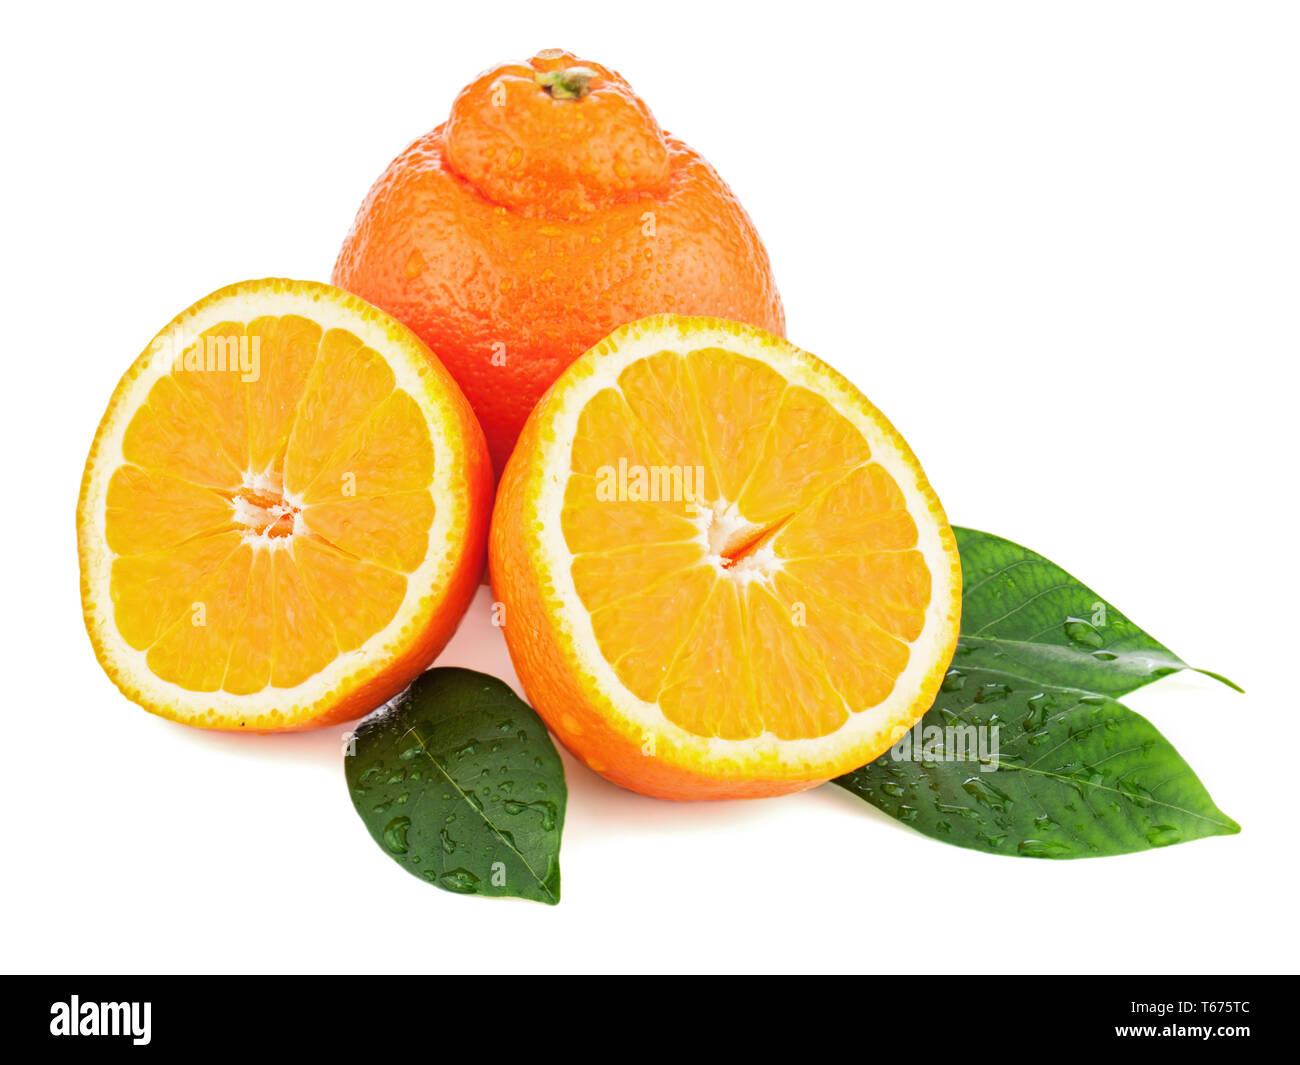 Fresh orange fruit with green leaves isolated on w - Stock Image